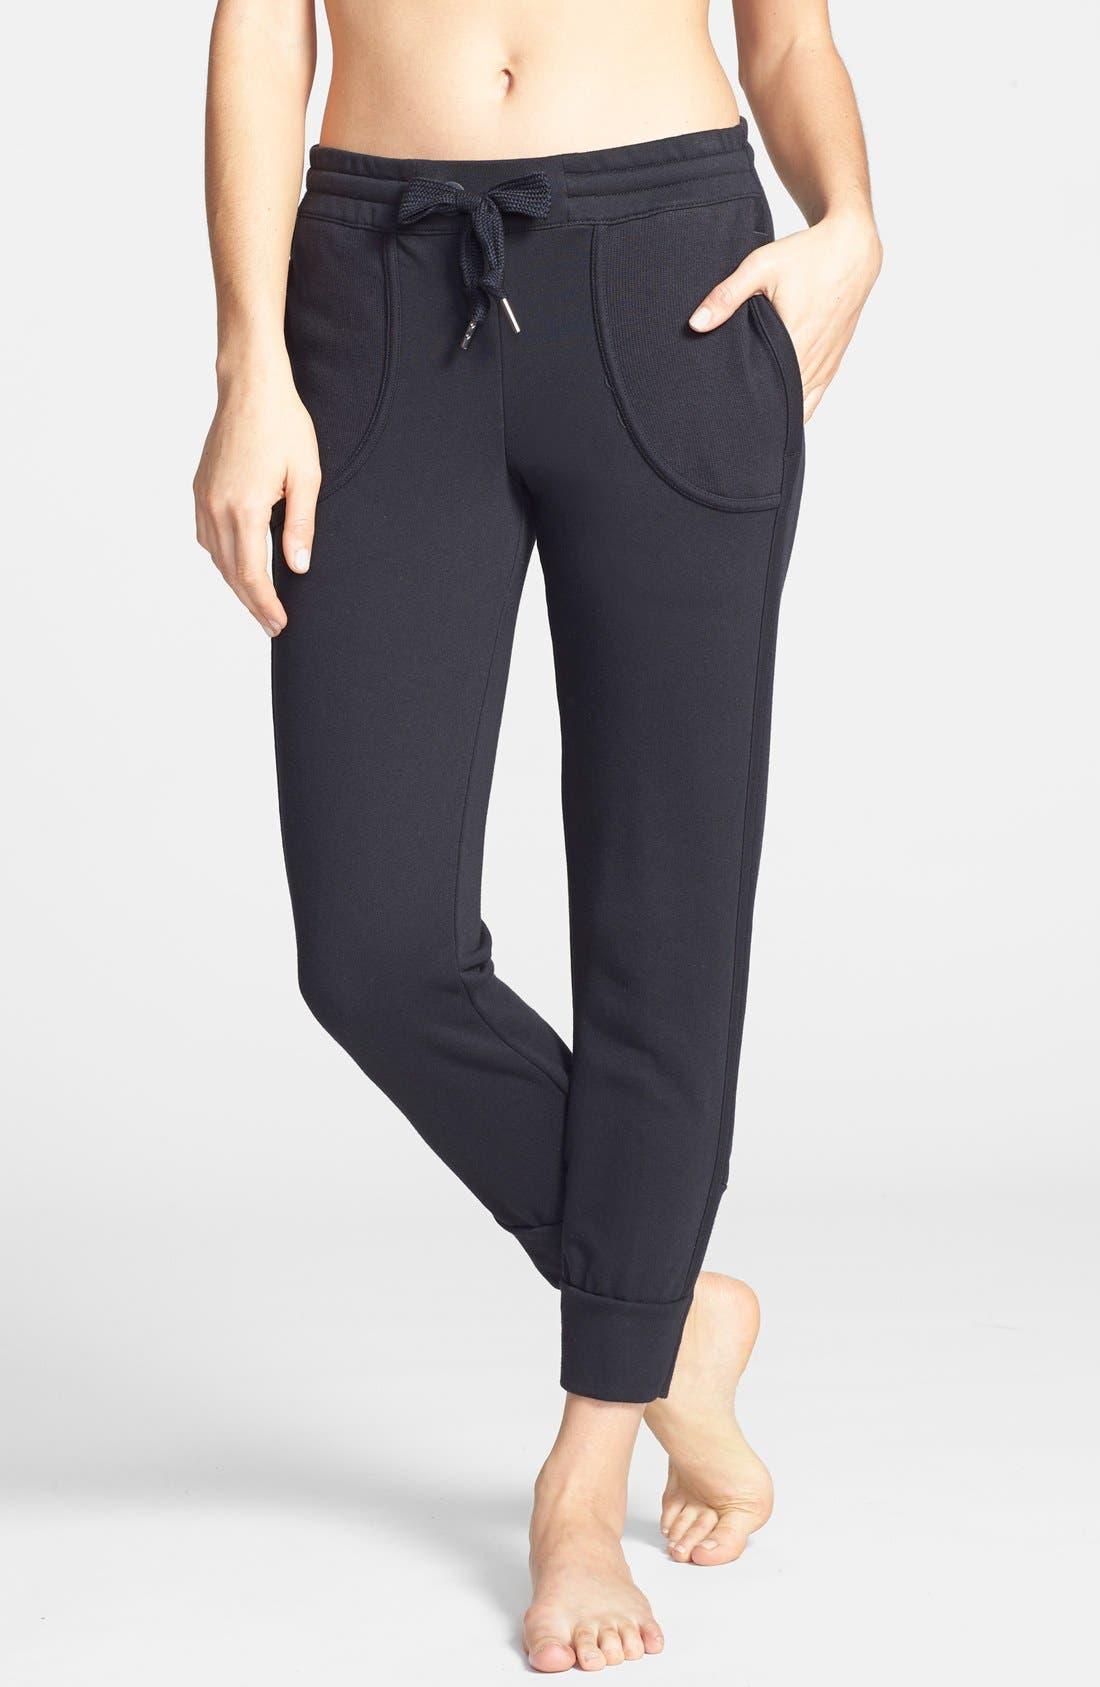 Main Image - adidas by Stella McCartney 'Essentials' Sweatpants